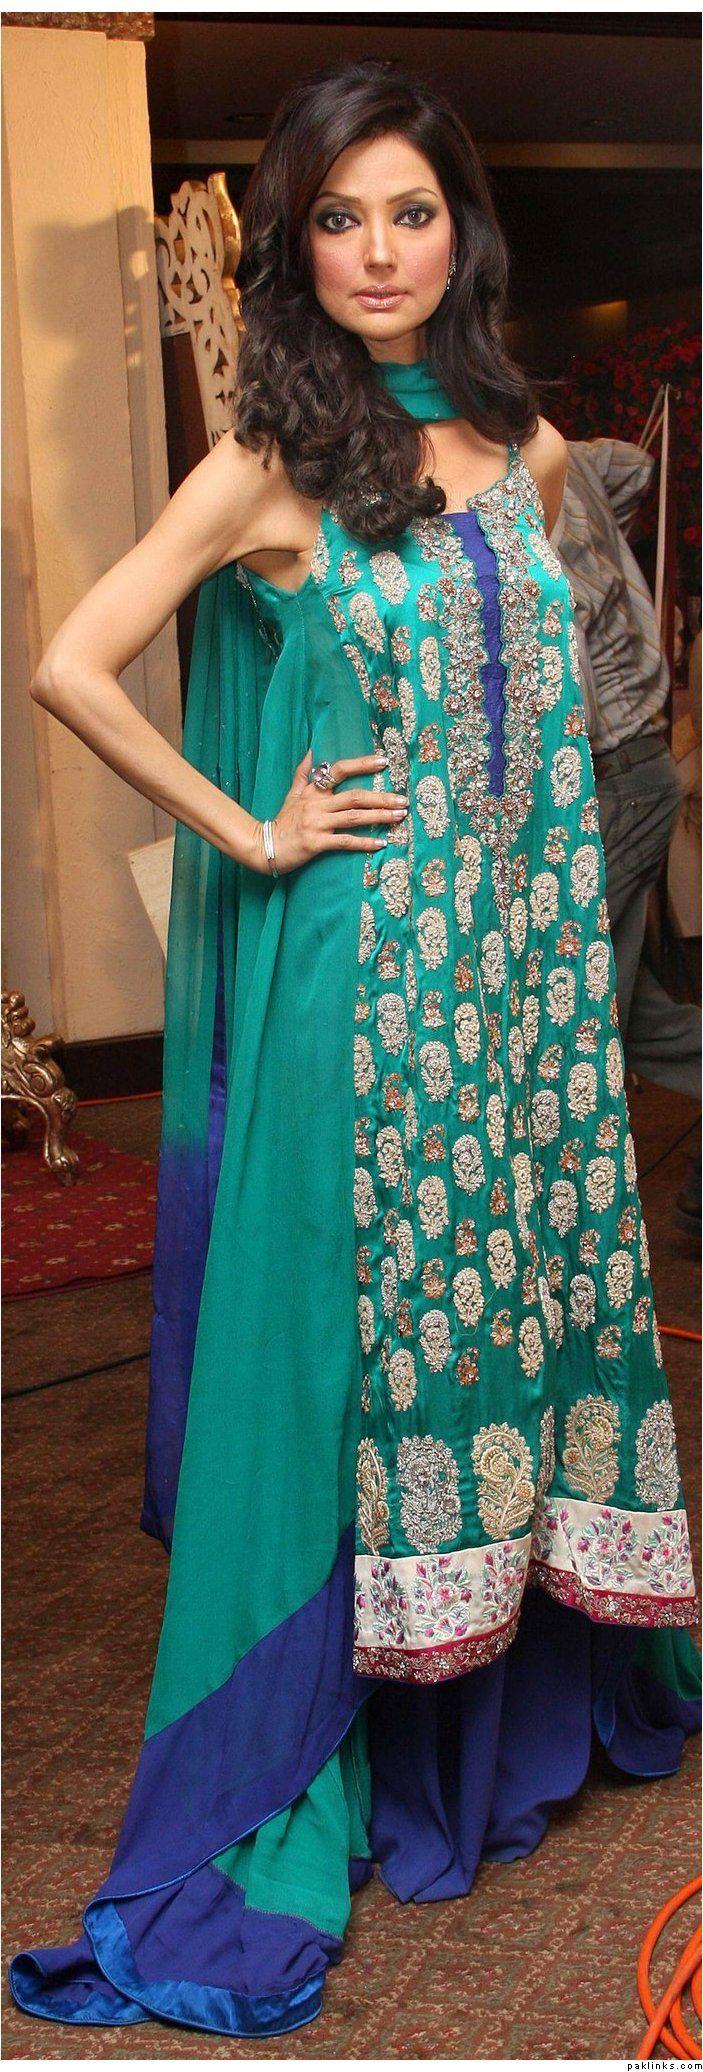 Get it at Amani www.facebook.com/2amani #Pakistani clothing #pakistani fashion #pakistani wedding #bridaldresses2014 #weddingdresses2014  #Pakistanidresses #dressdesigns